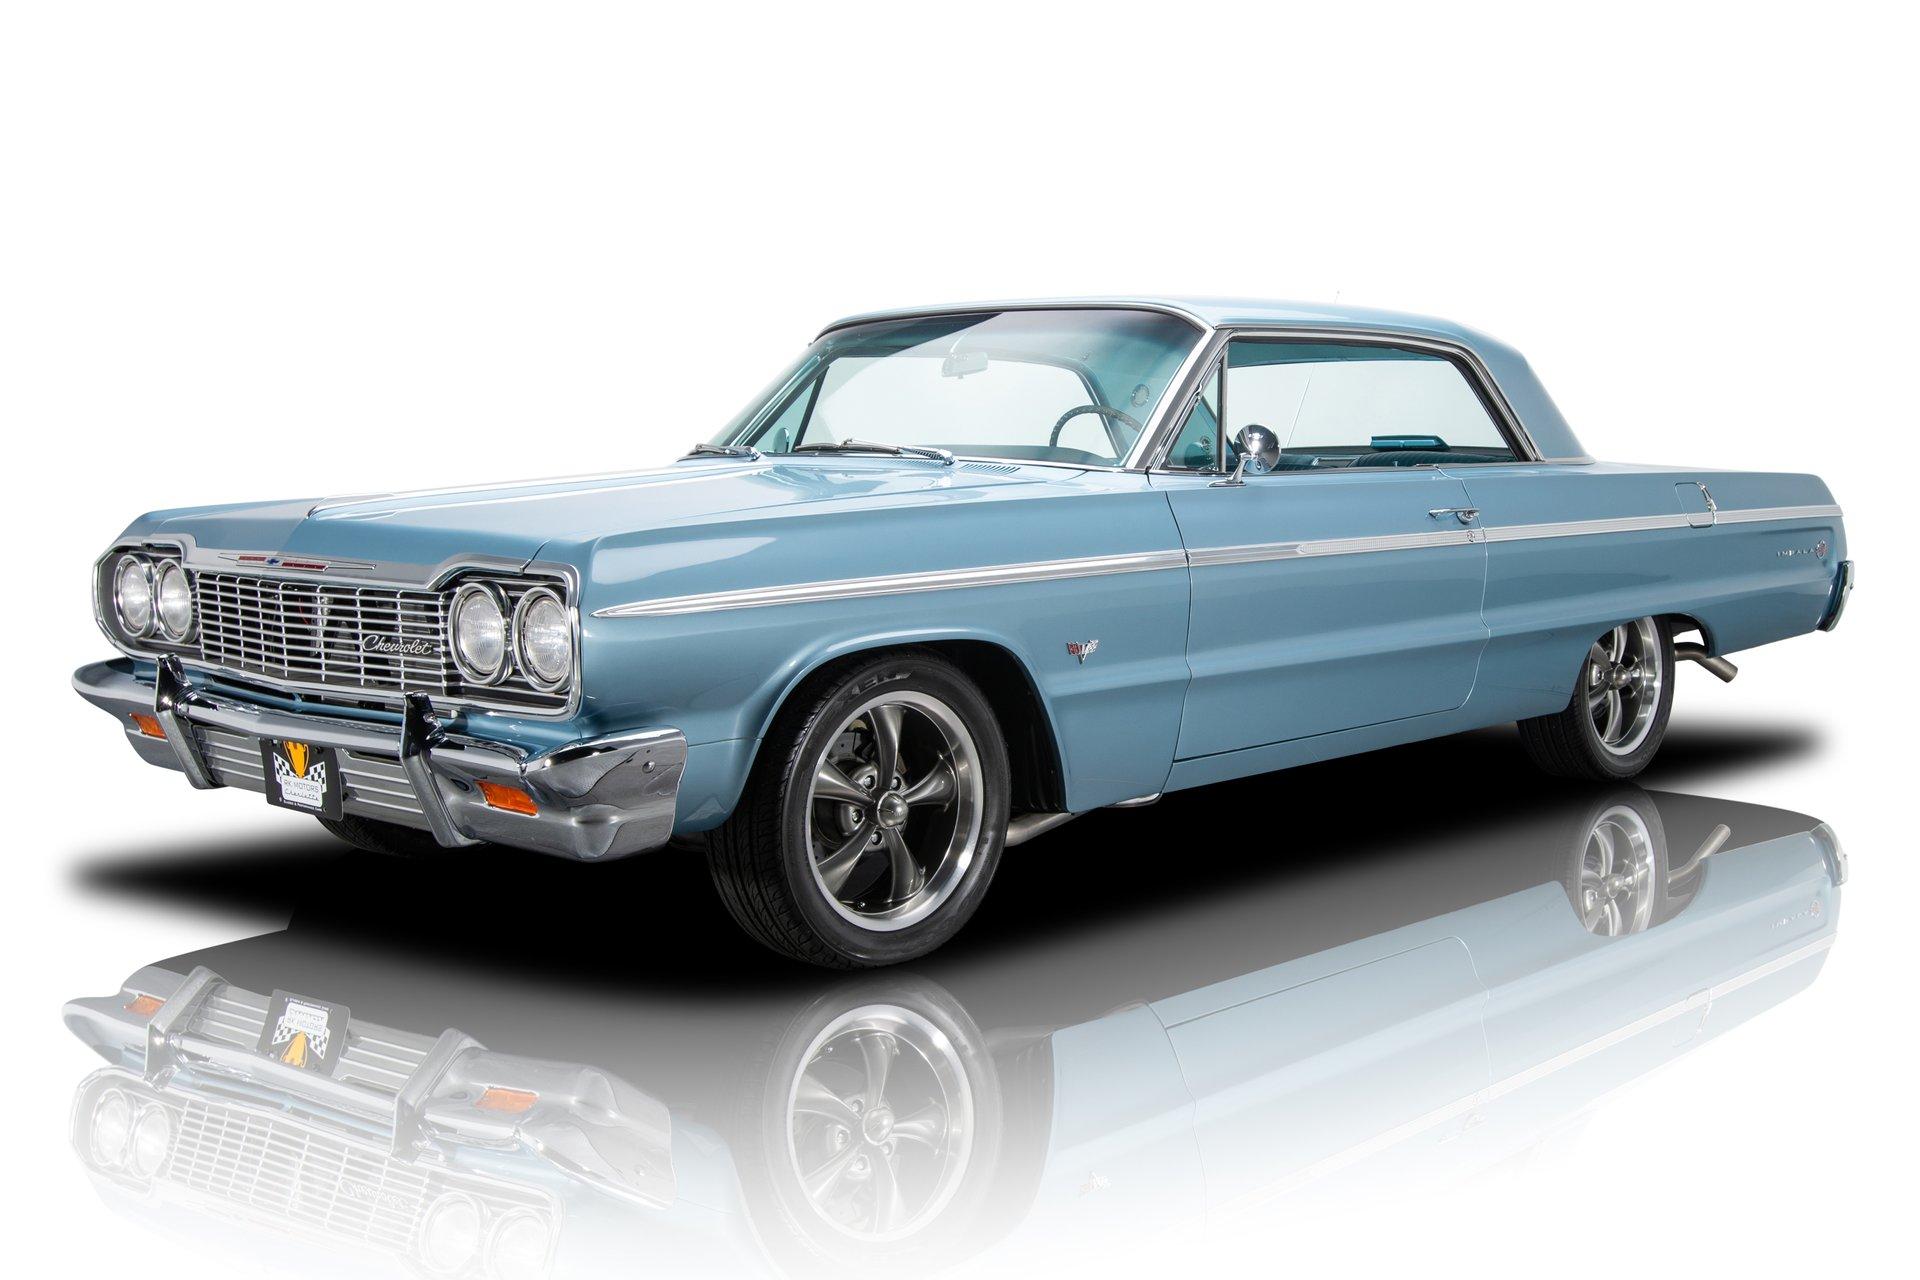 hight resolution of award winning restored impala ss restomod 327 v8 4spd automatic a c